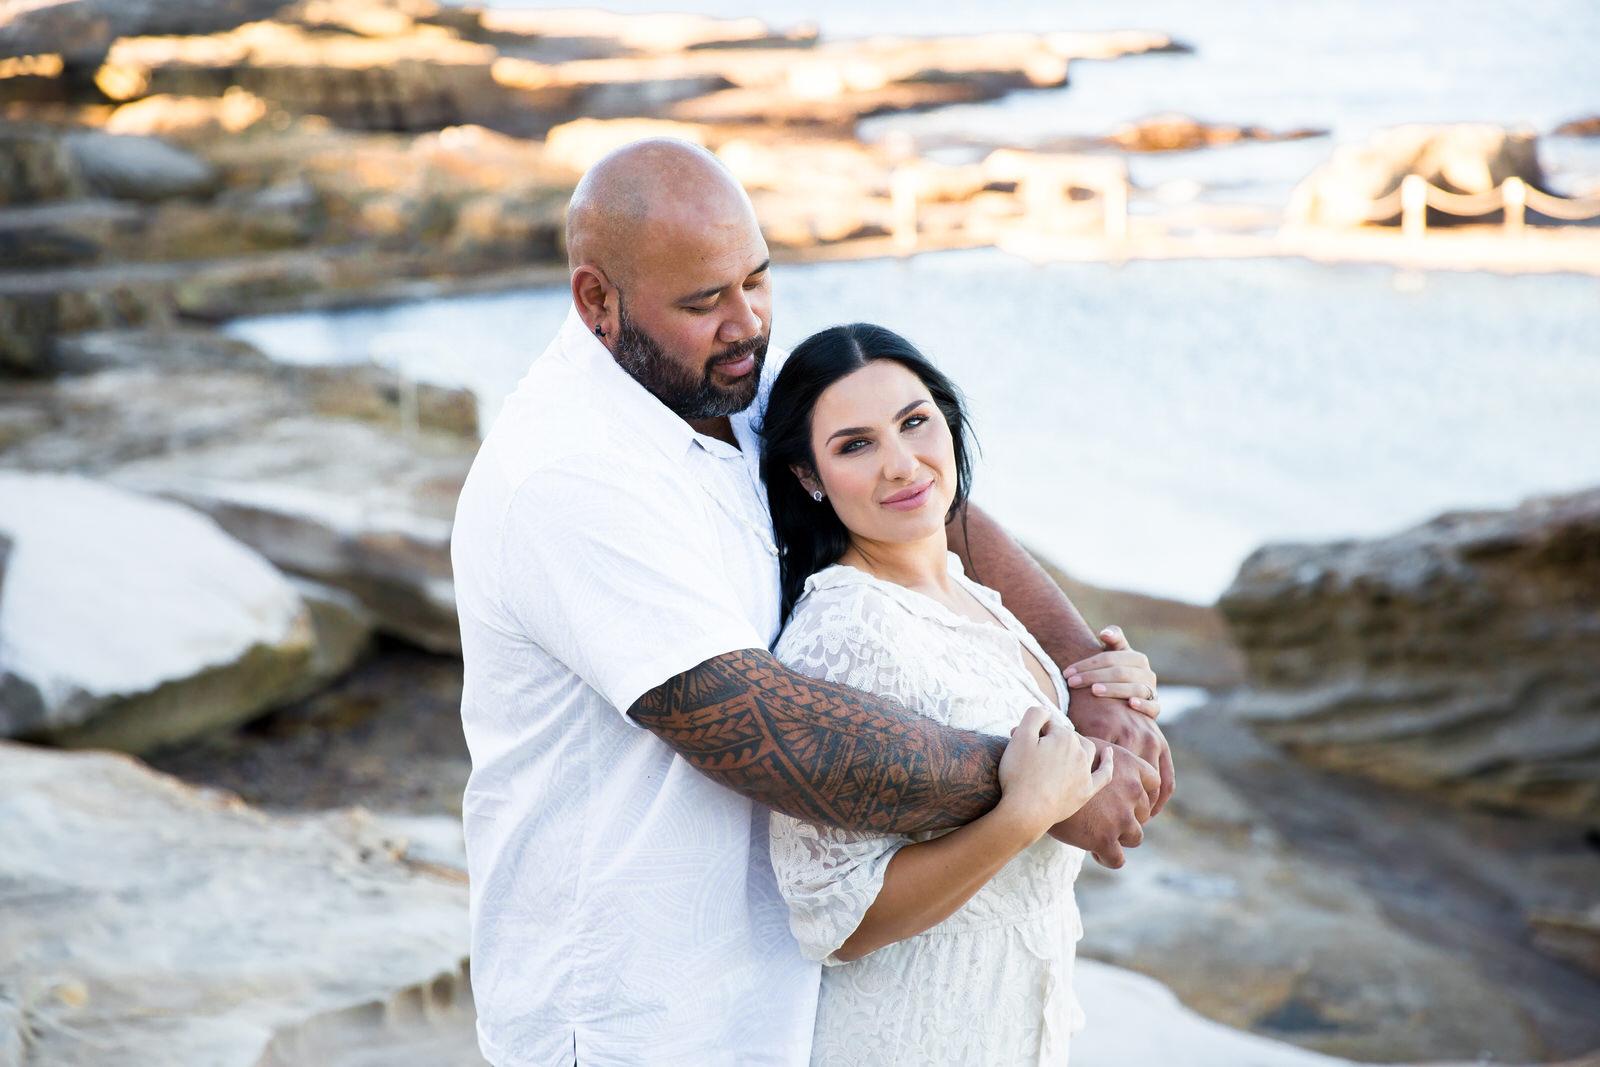 Sydney Wedding Photographer - Maroubra Beach - Jennifer Lam Photography (2).jpg